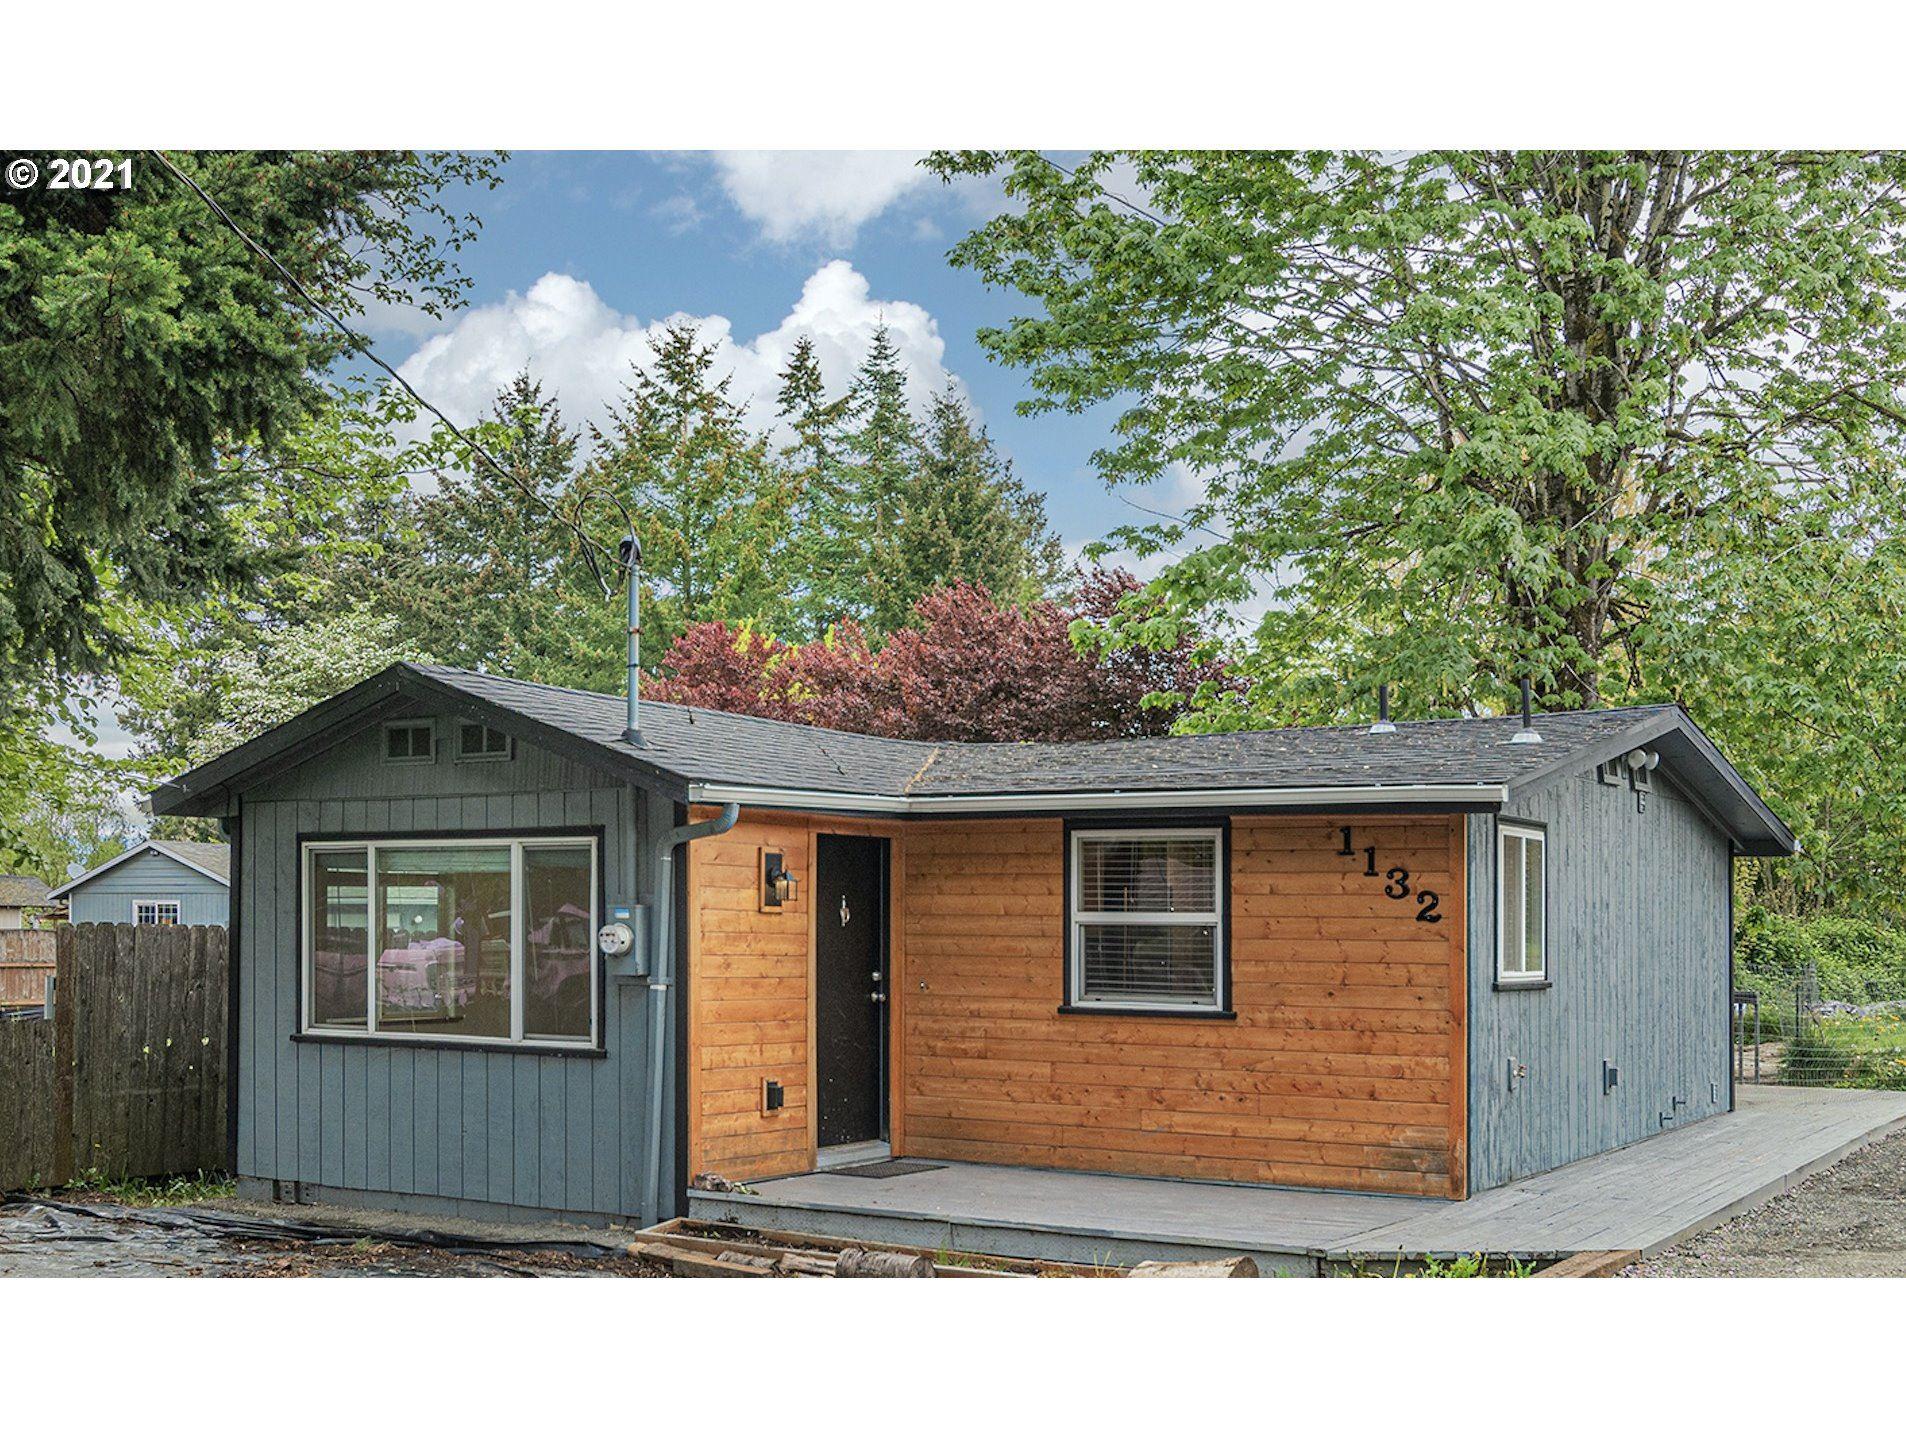 1132 NE 155TH AVE, Portland, OR 97230 - MLS#: 21463882